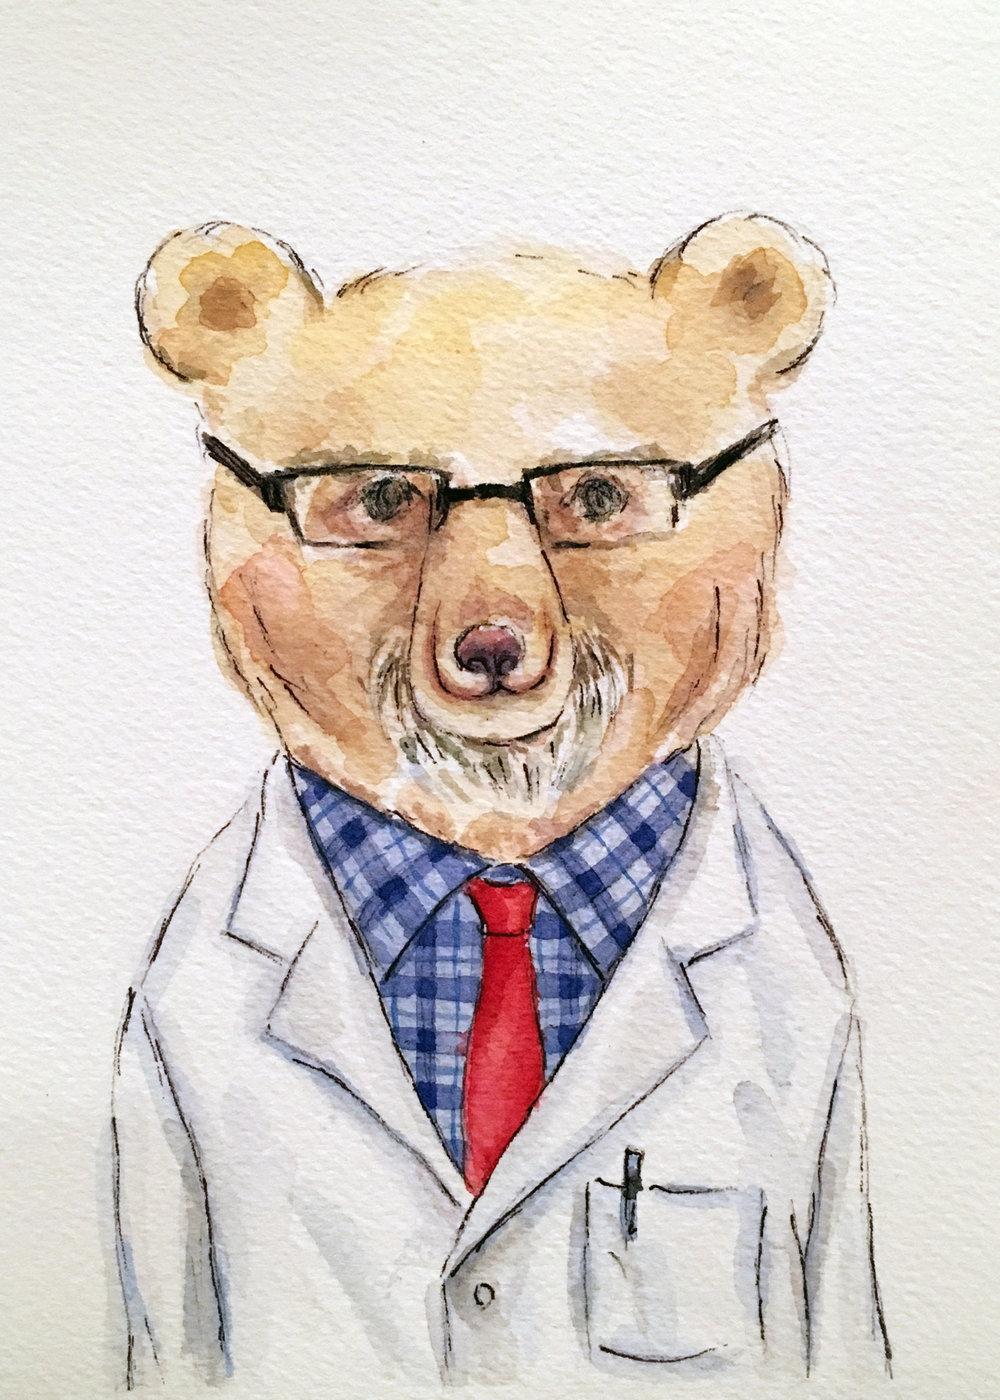 Dr. Roberts